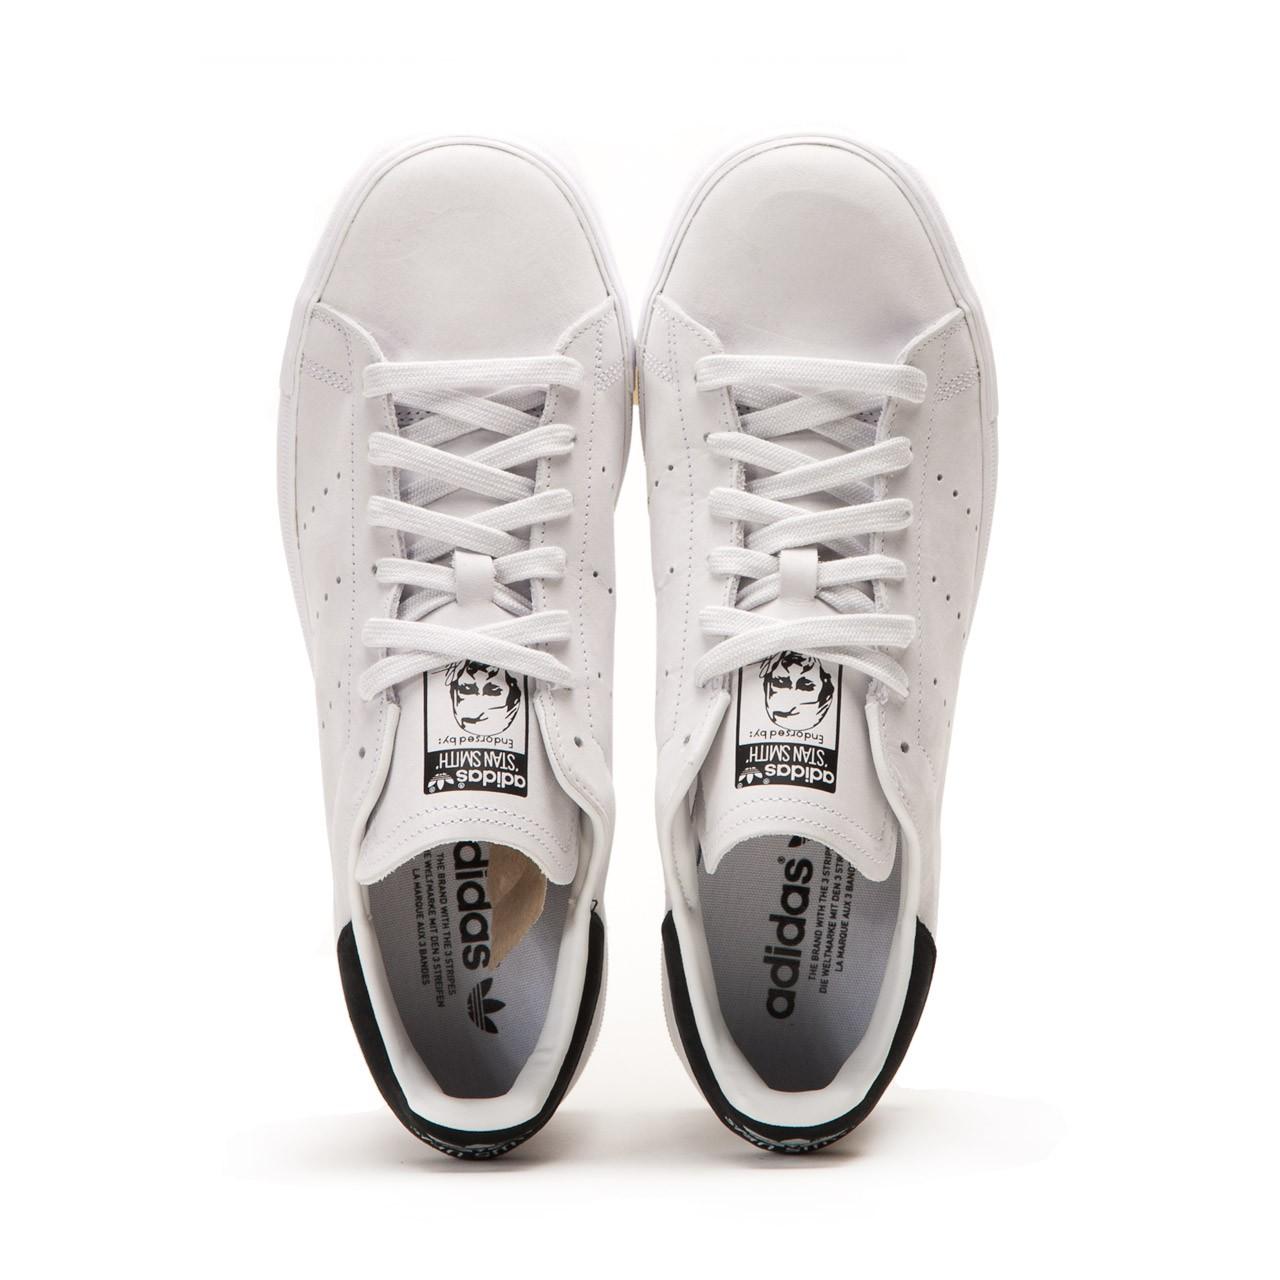 adidas-stan-smith-vulc-vintage-white-core-black-5.jpg